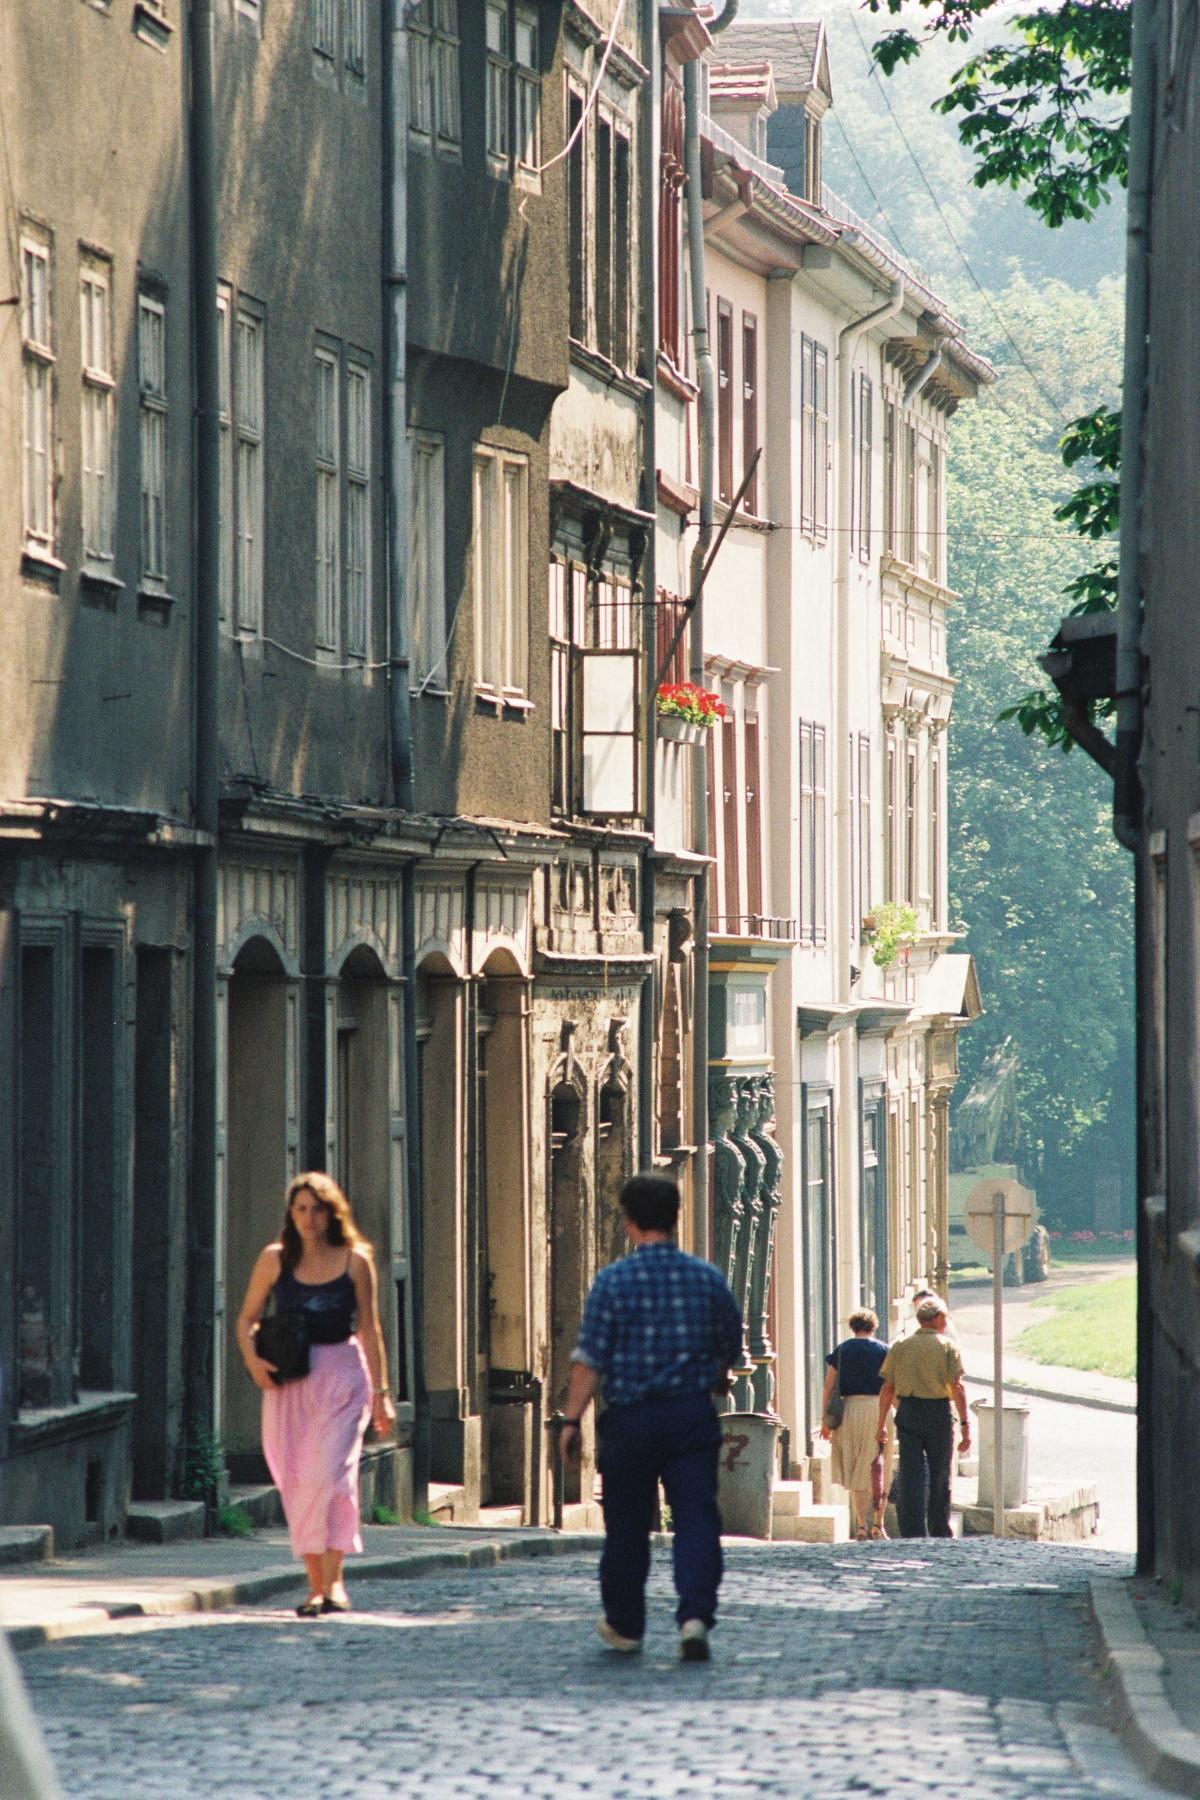 Blick in die Schloßgasse in Weimar im Juni 1990.